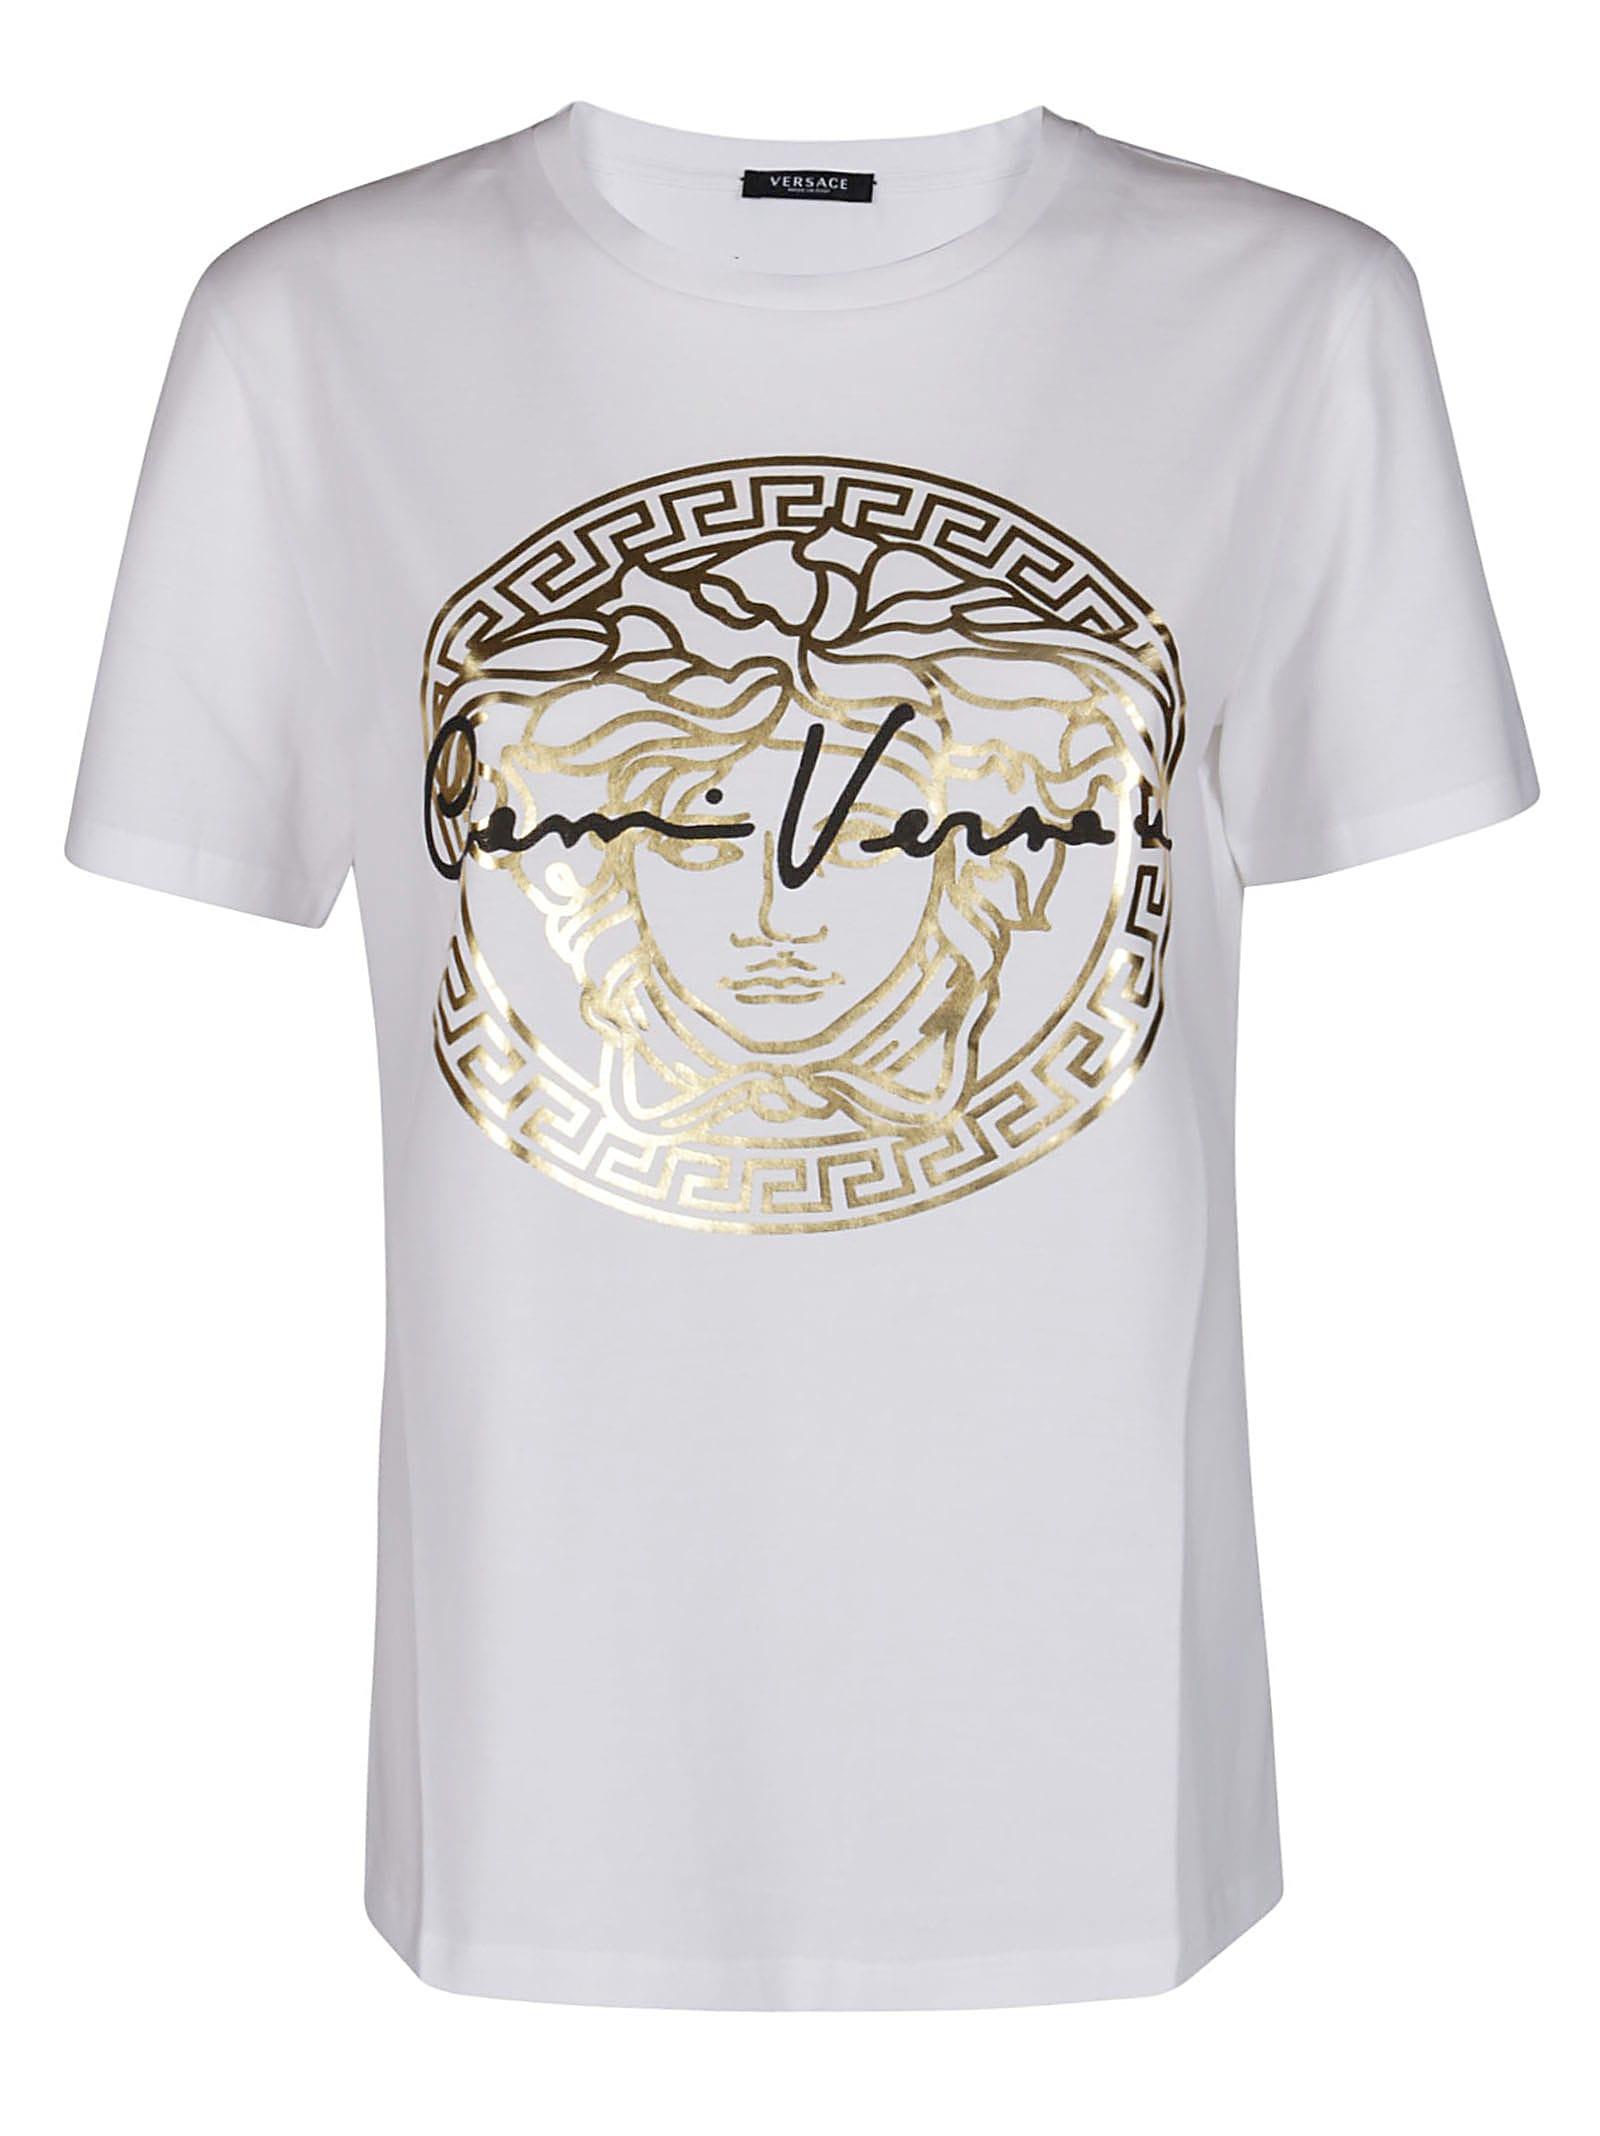 Versace White Cotton T-shirt